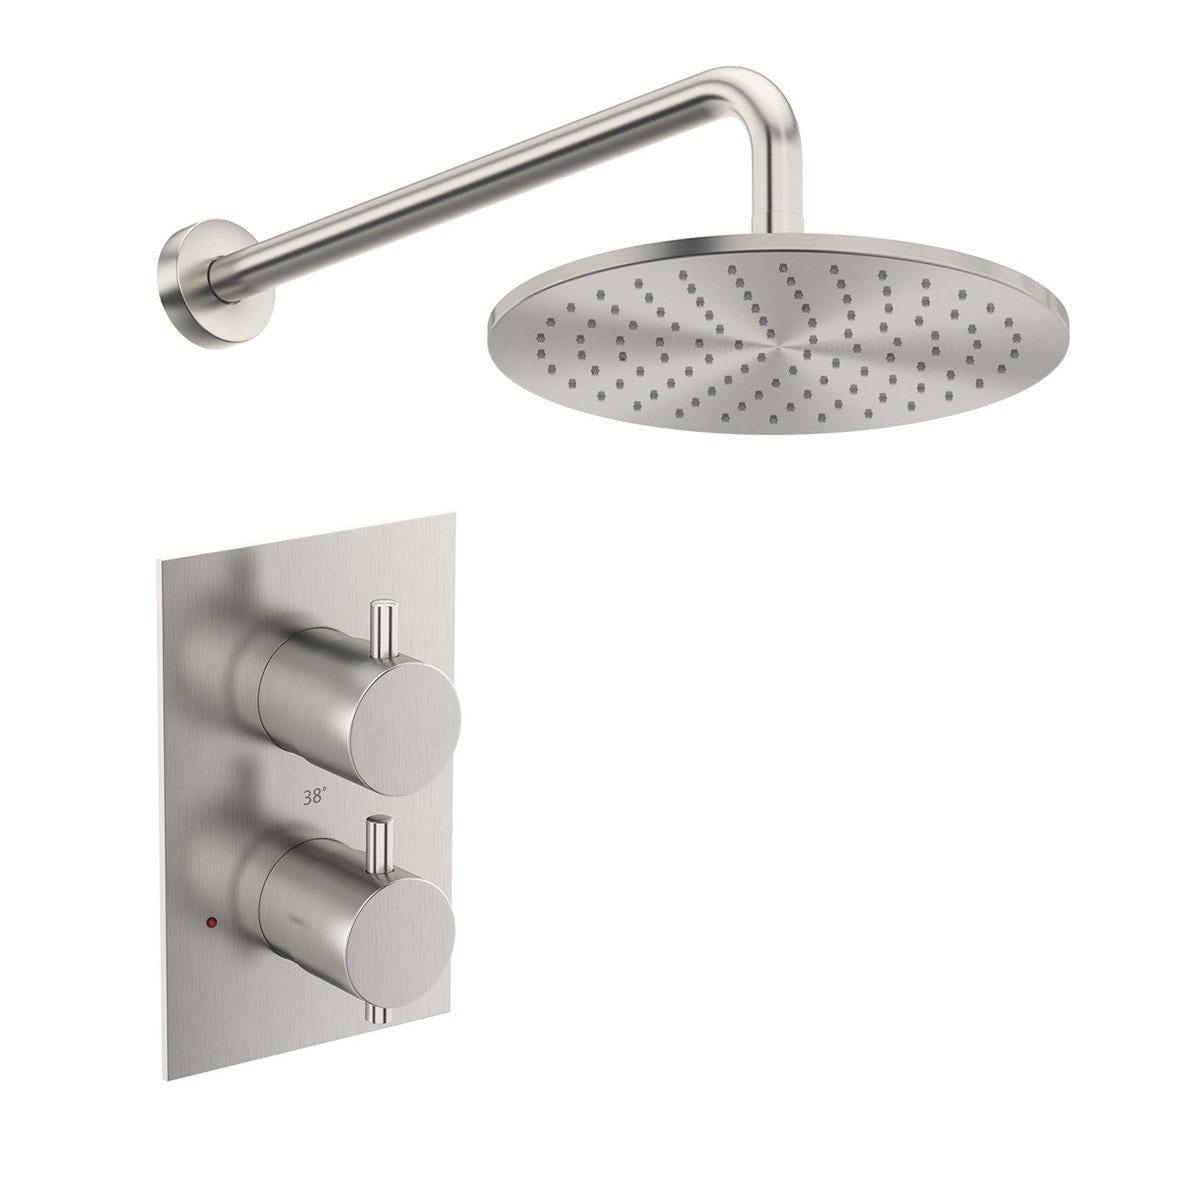 New Shower Head Square Brushed Nickel Bathroom Tapware Range